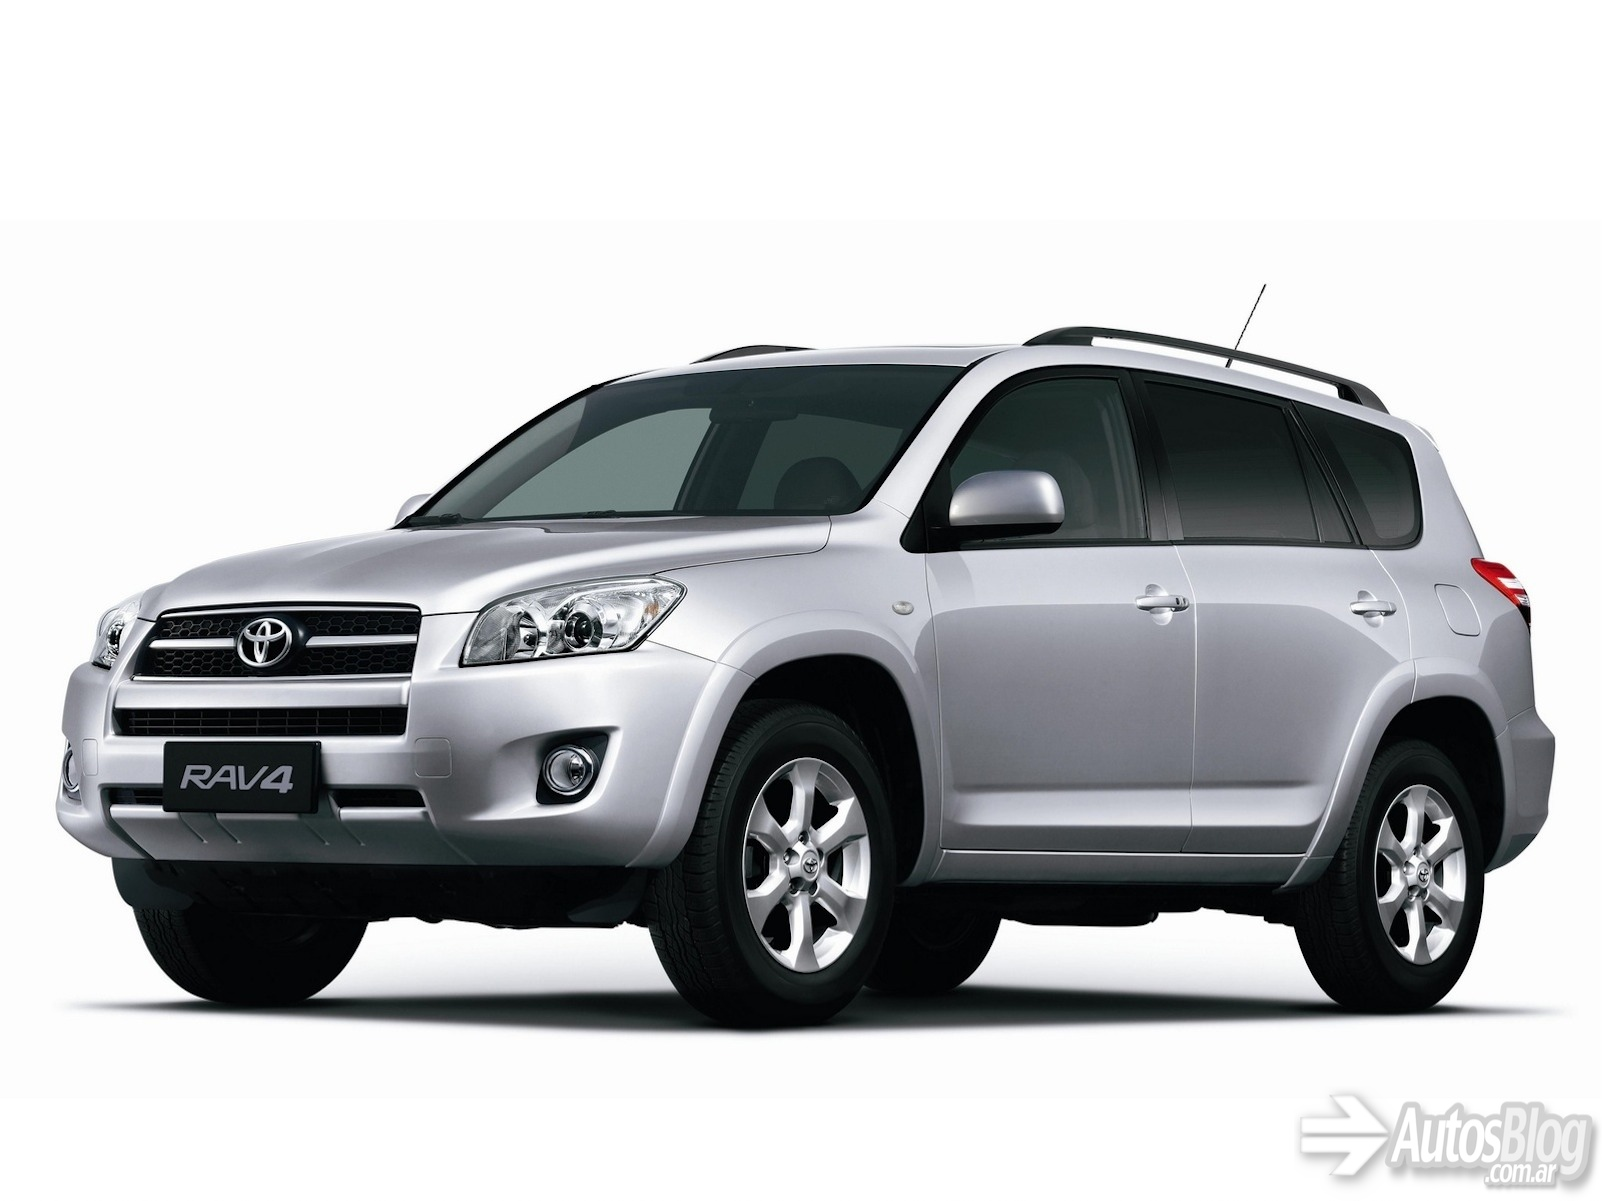 Toyota RAV4 2012 Argentina Galería Free Download Image Of